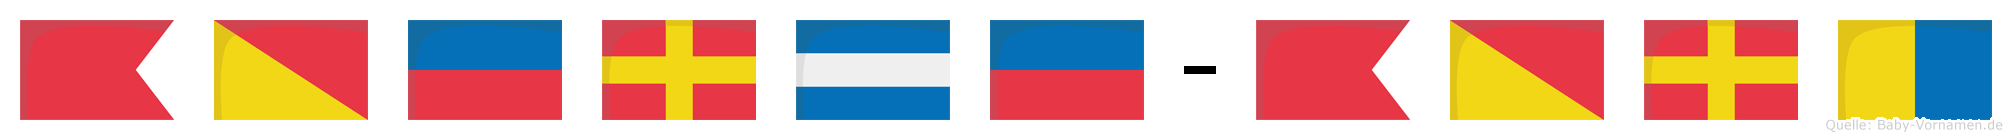 Börje-Bork im Flaggenalphabet